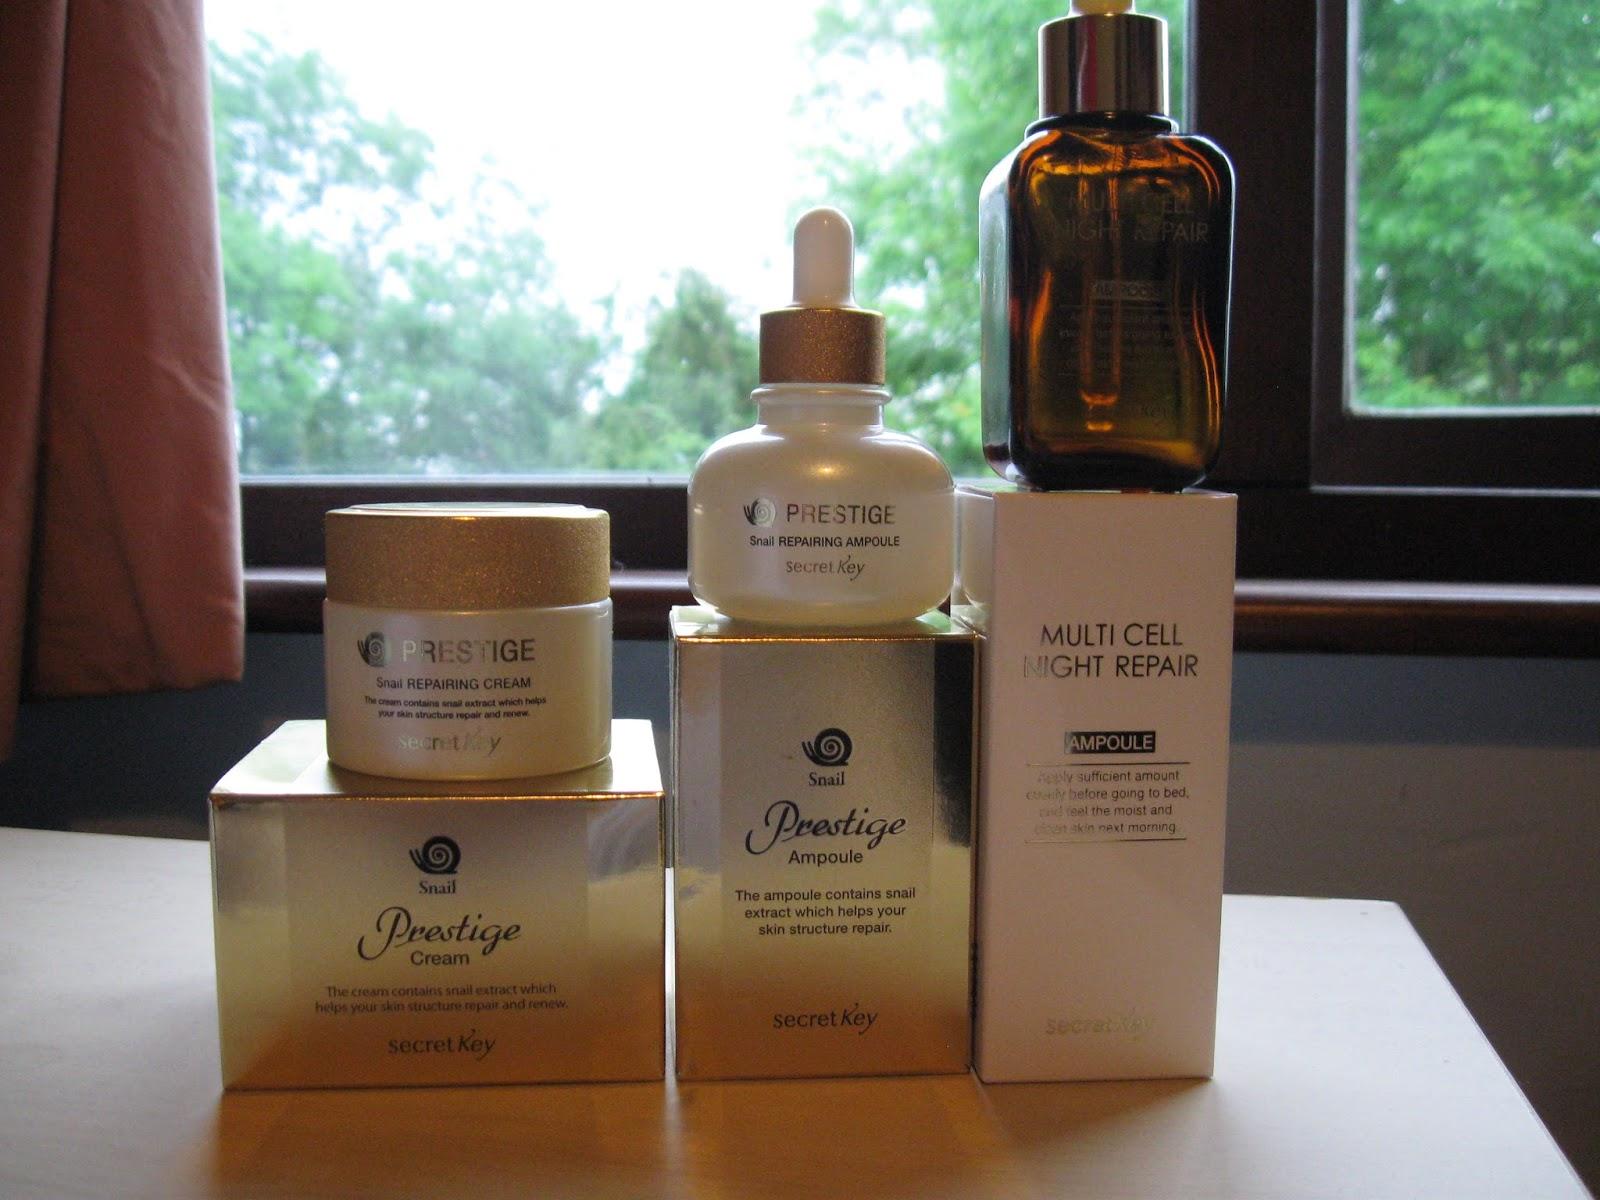 Review Secret Key Snail Prestige Wonderful Range For Skin Treatment Cream 50gr Care On A Budget